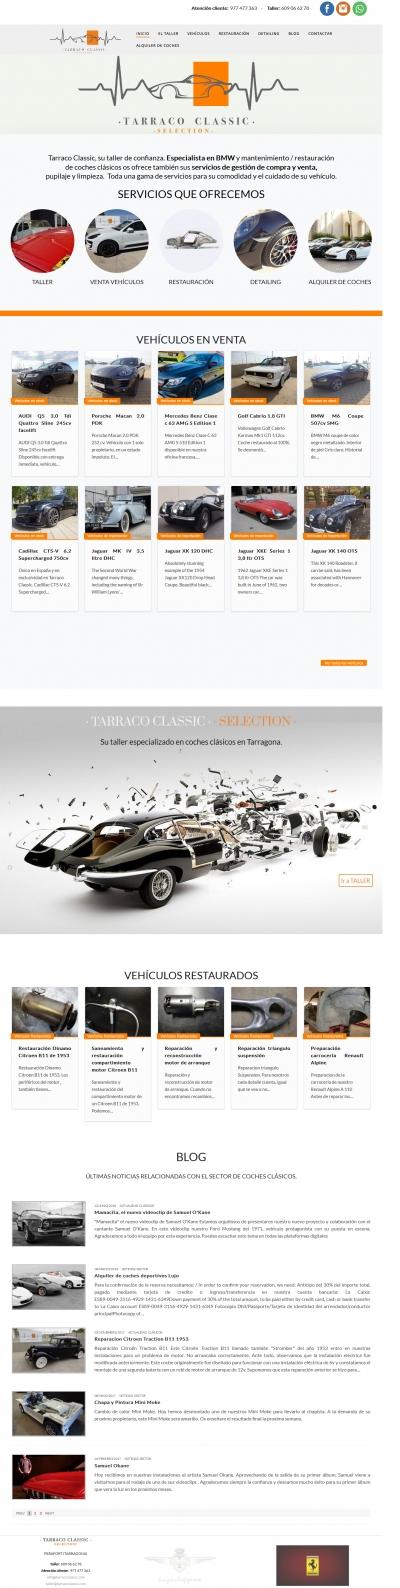 Diseño de página web para taller de coches clásicos